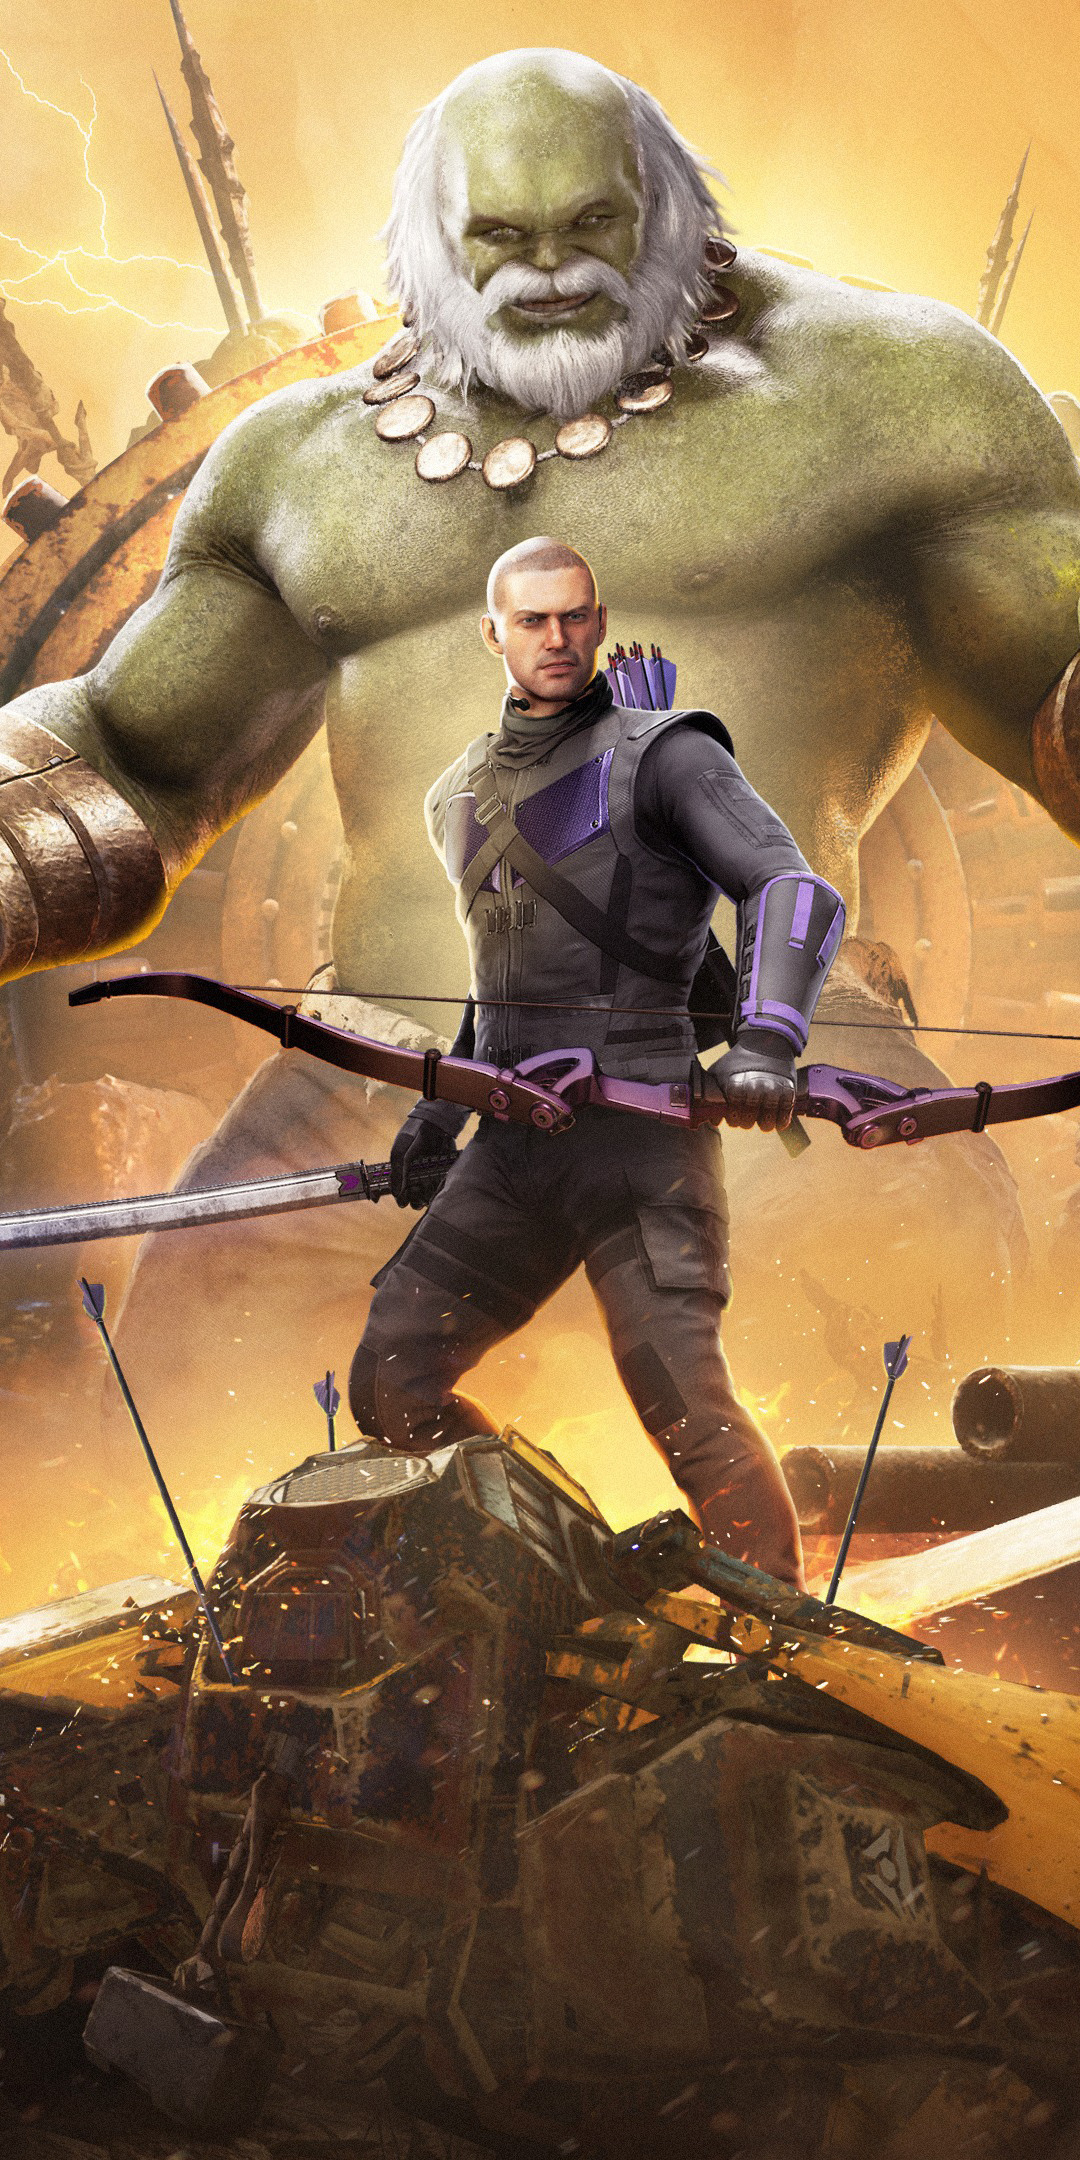 marvels-avengers-operation-hawkeye-future-imperfect-4k-4i.jpg